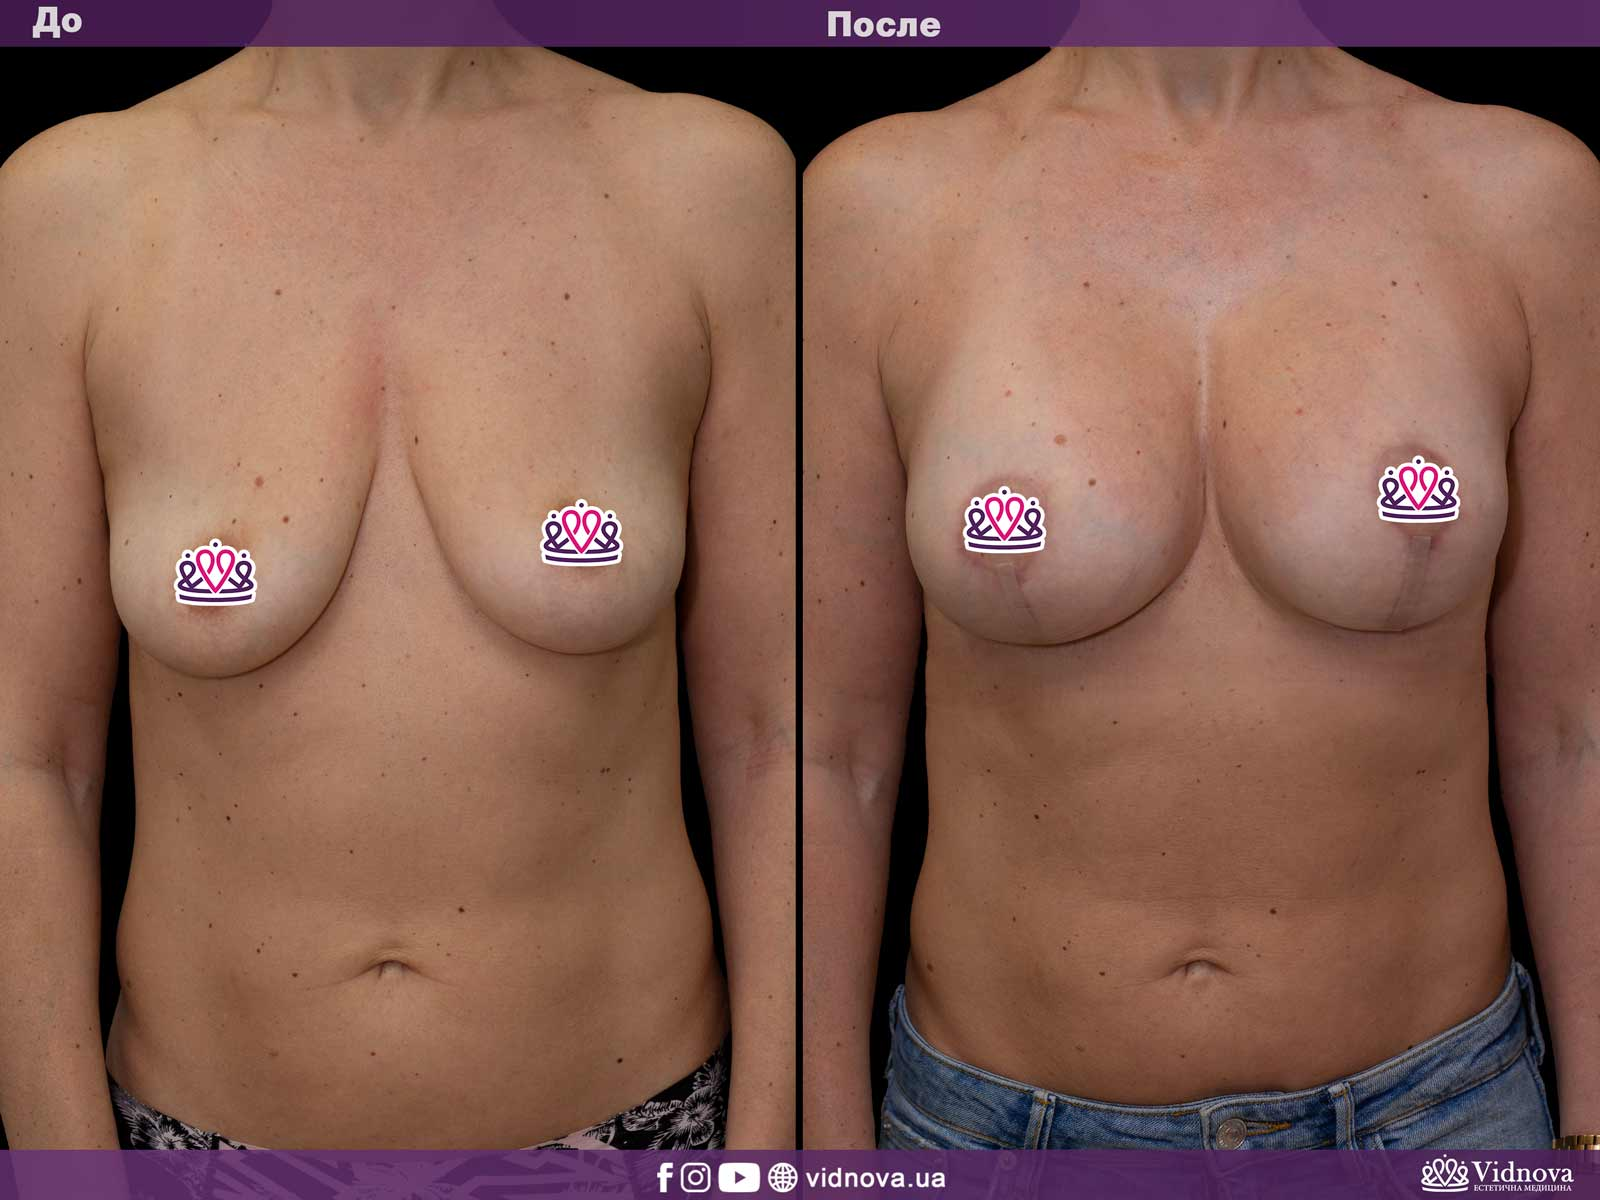 Подтяжка груди: Фото ДО и ПОСЛЕ - Пример №7-1 - Клиника Vidnova